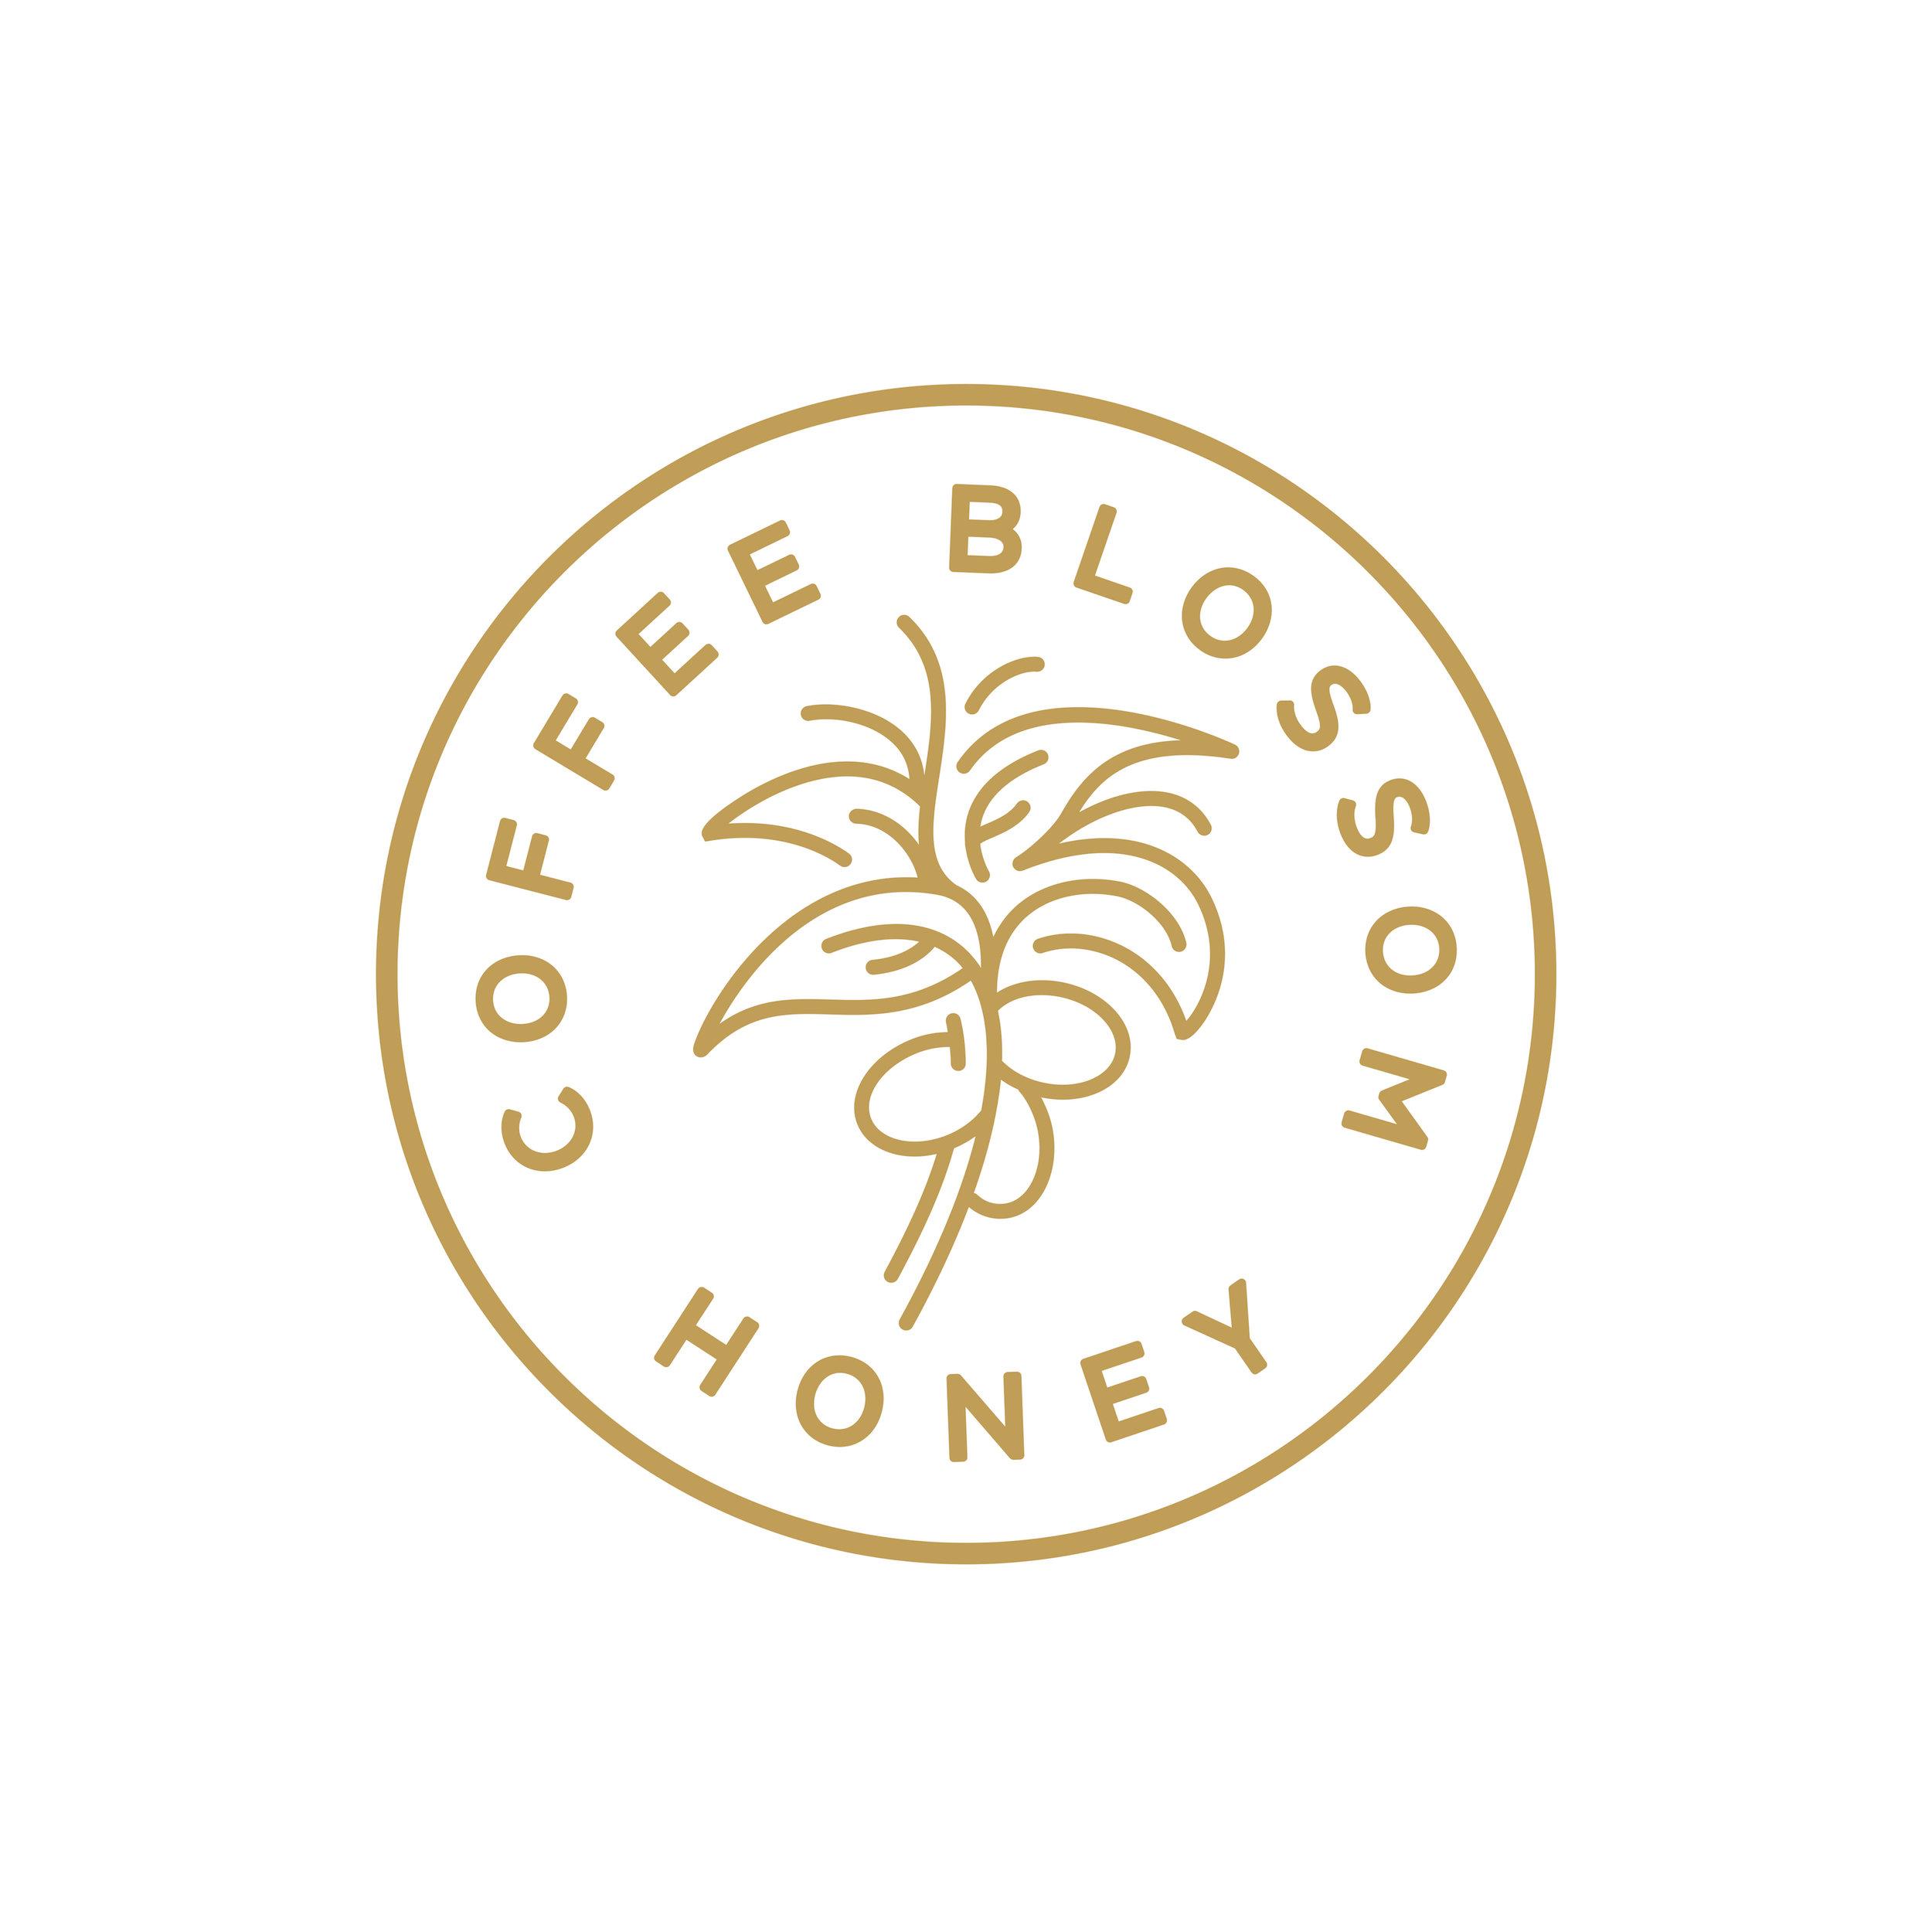 CBH Logo_Circle1.jpg